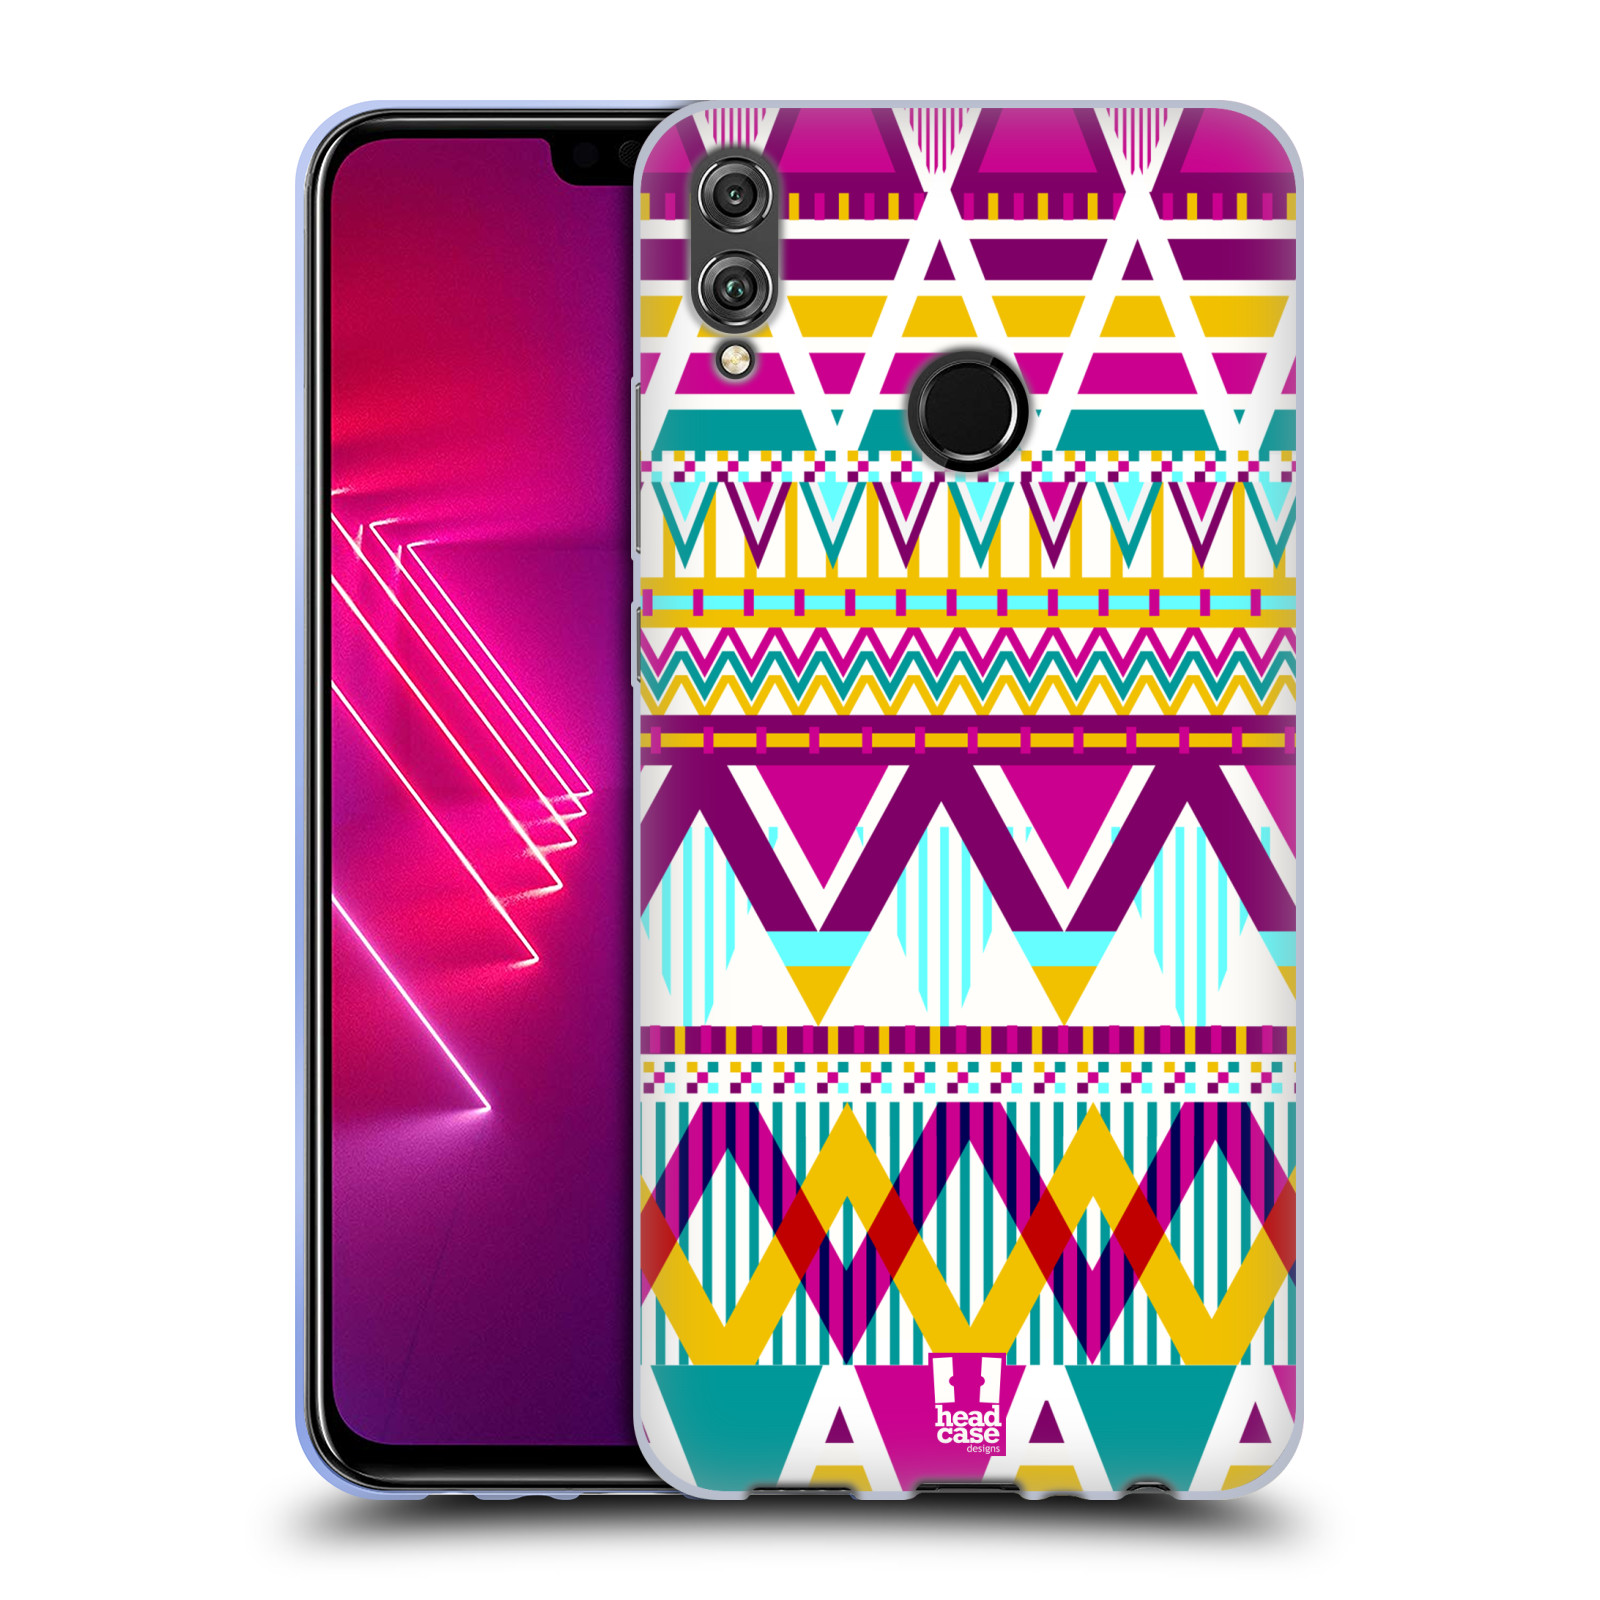 Silikonové pouzdro na mobil Honor View 10 Lite - Head Case - AZTEC SUGARED